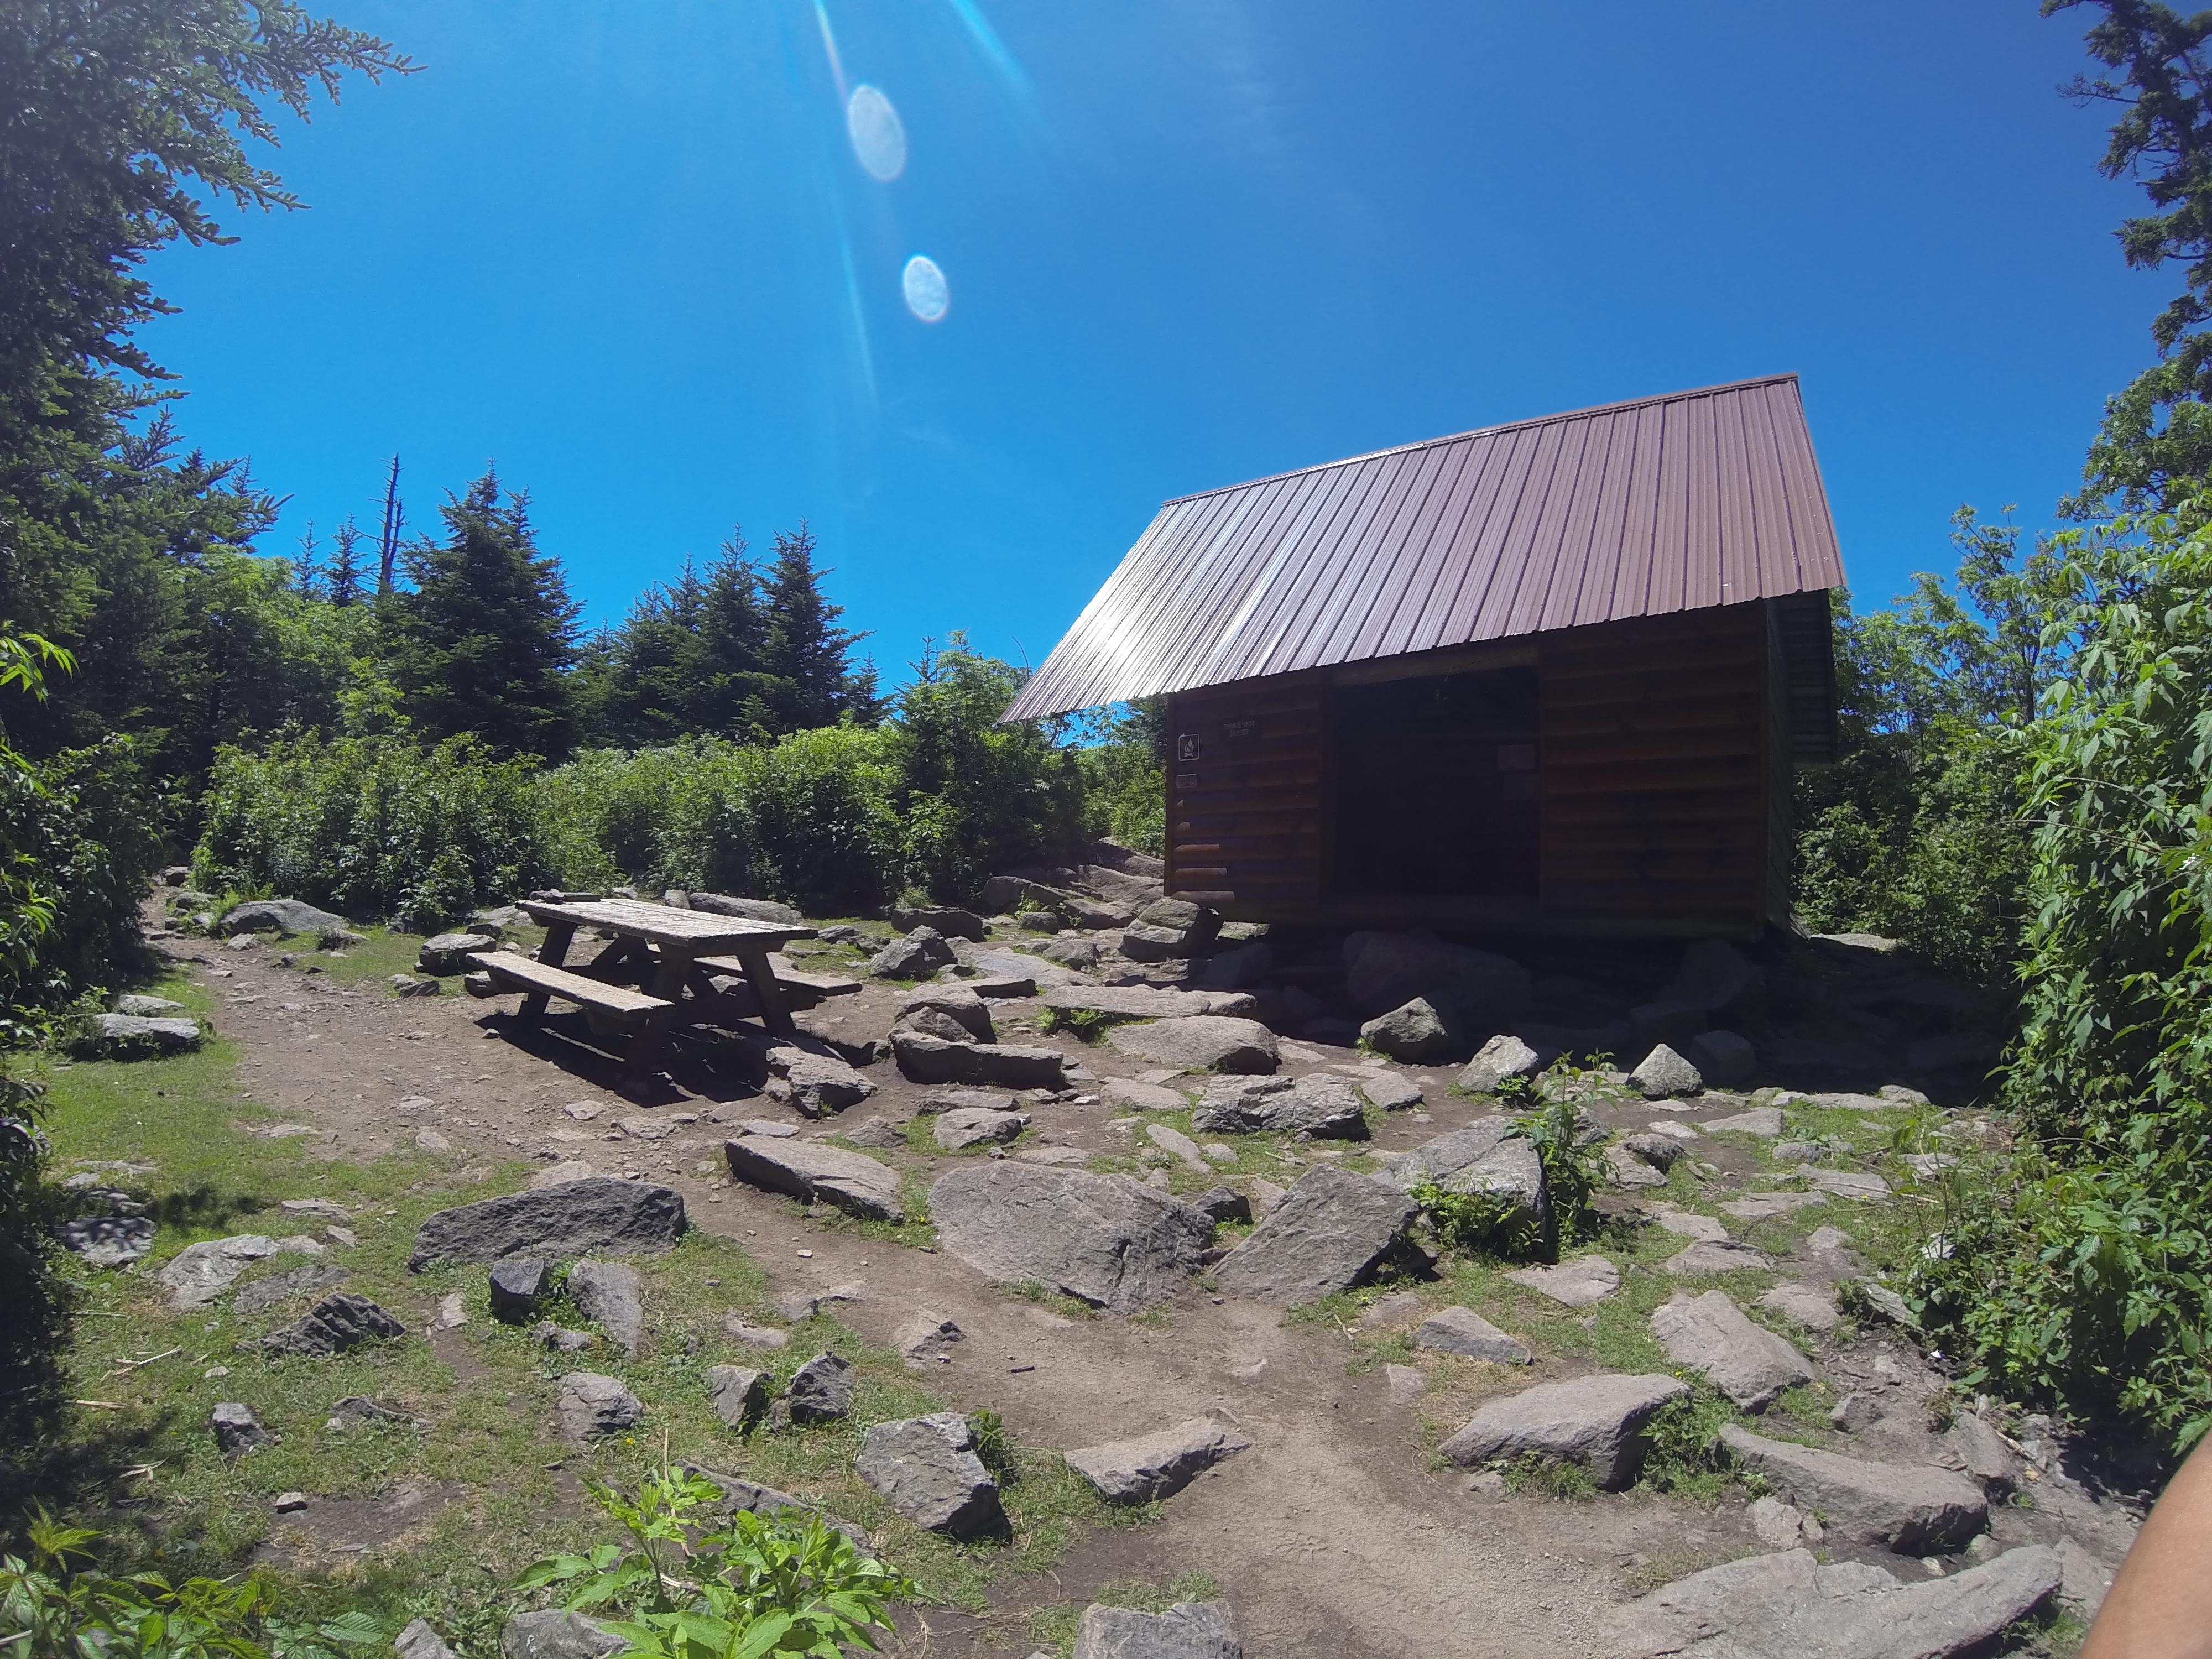 Thunder Mountain Shelter-Mt. Rogers